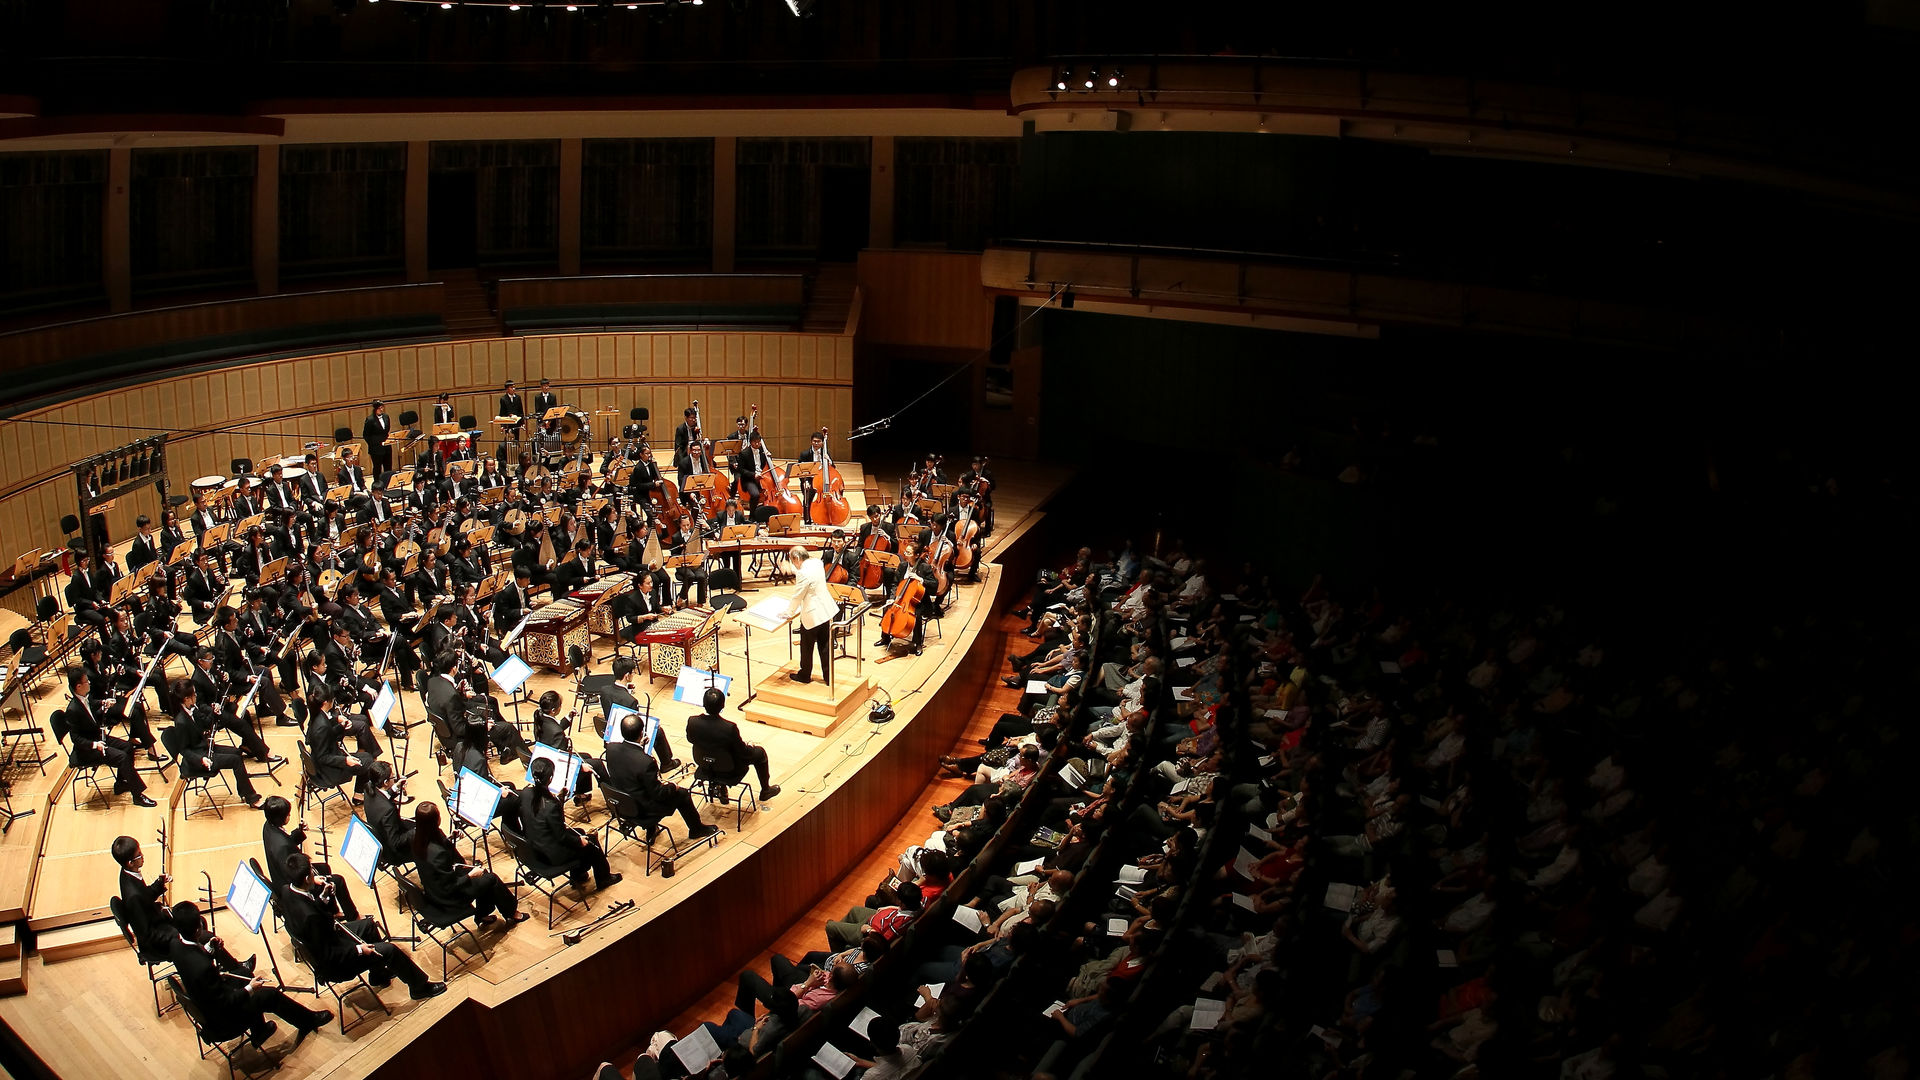 Photo - Orchestra - 5-DPP_0158.JPG